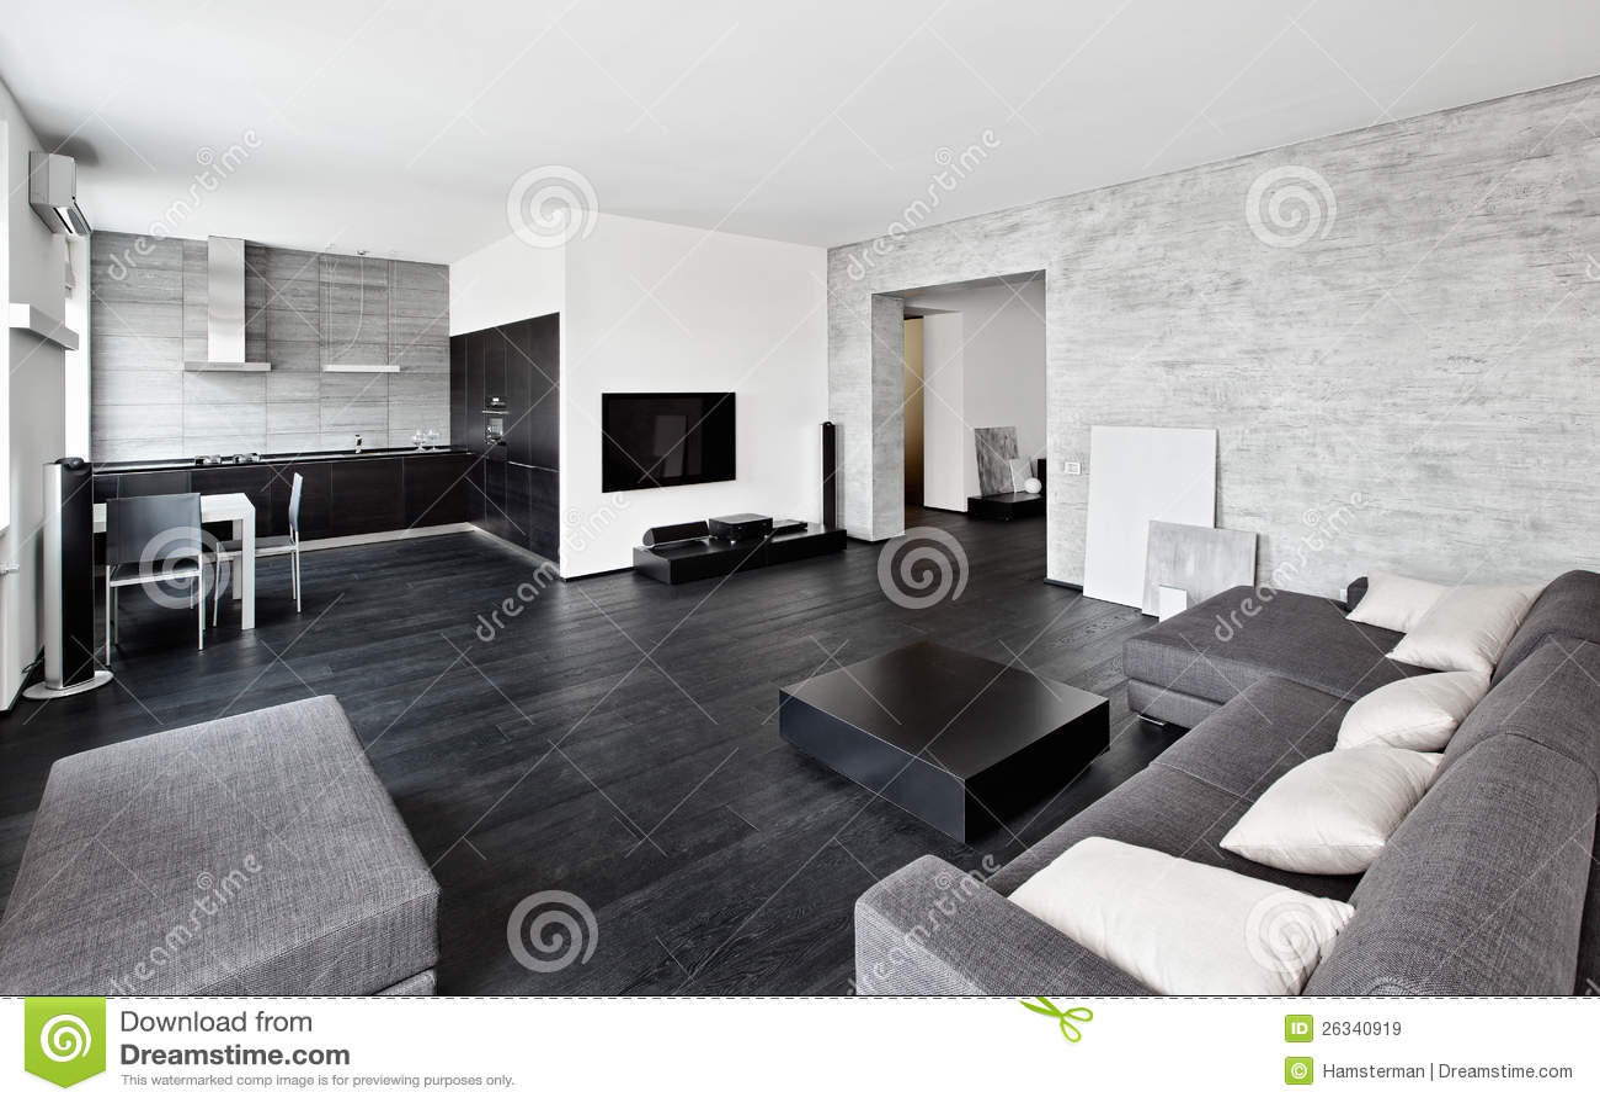 Черно бел квартиры дизайн